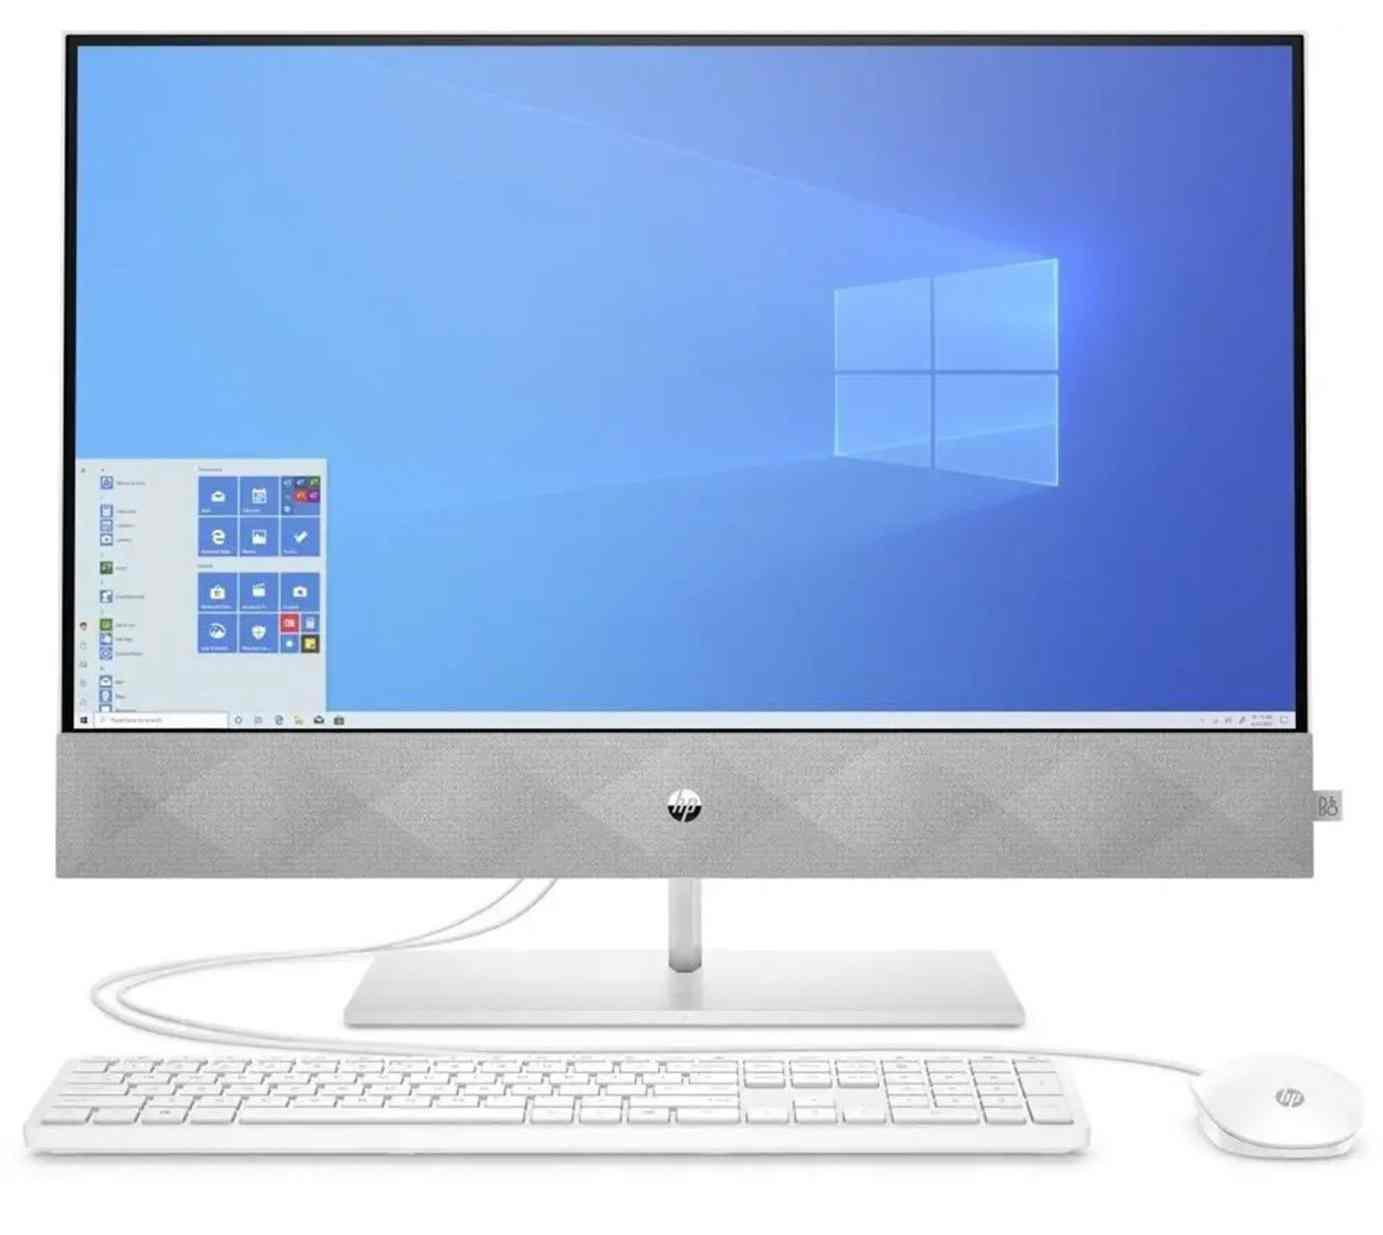 HP Pavilion 27-inch All-in-One Desktop